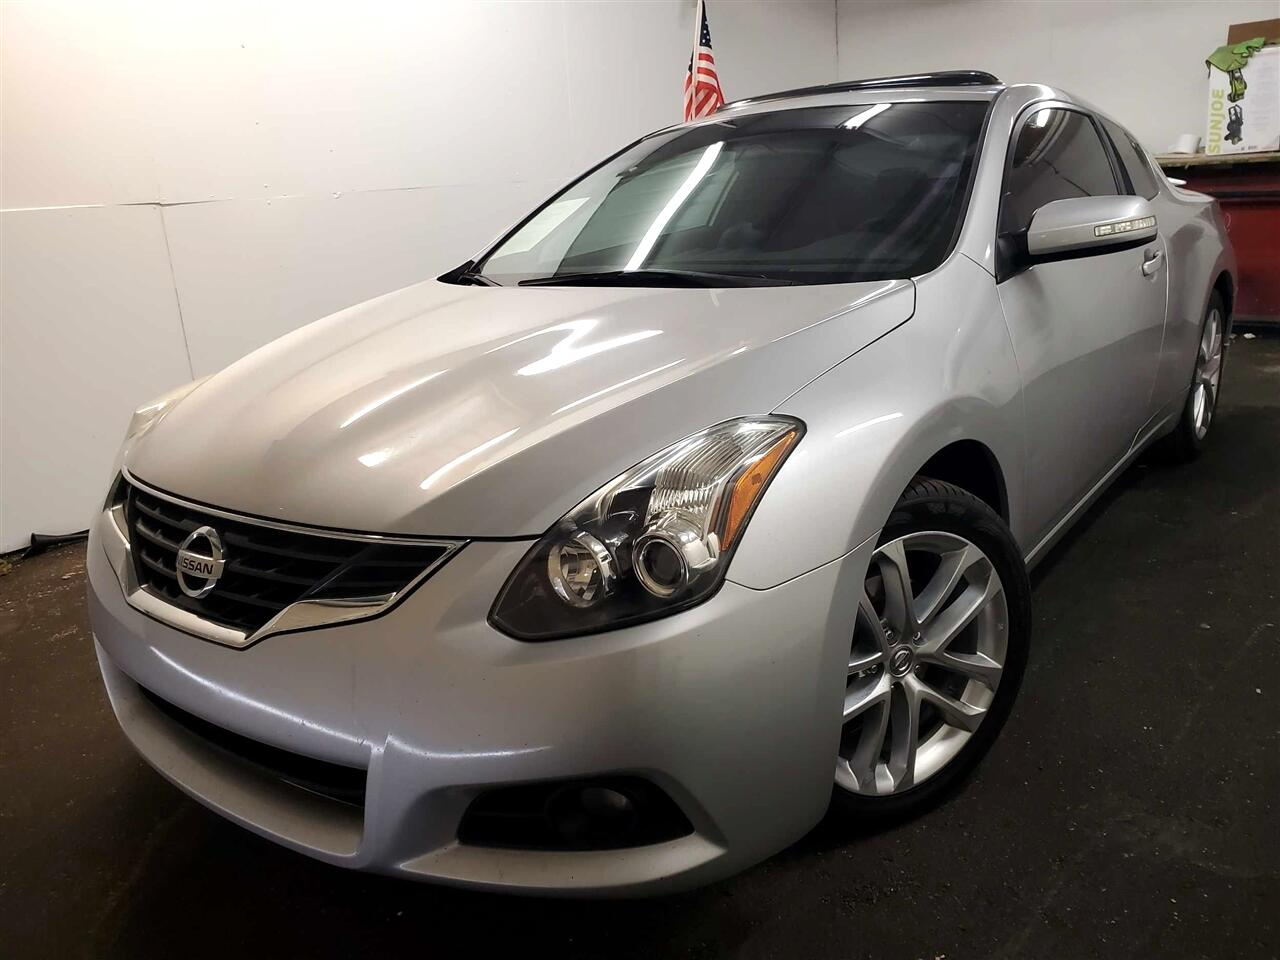 Nissan Altima 3.5 SR CVT Coupe 2011